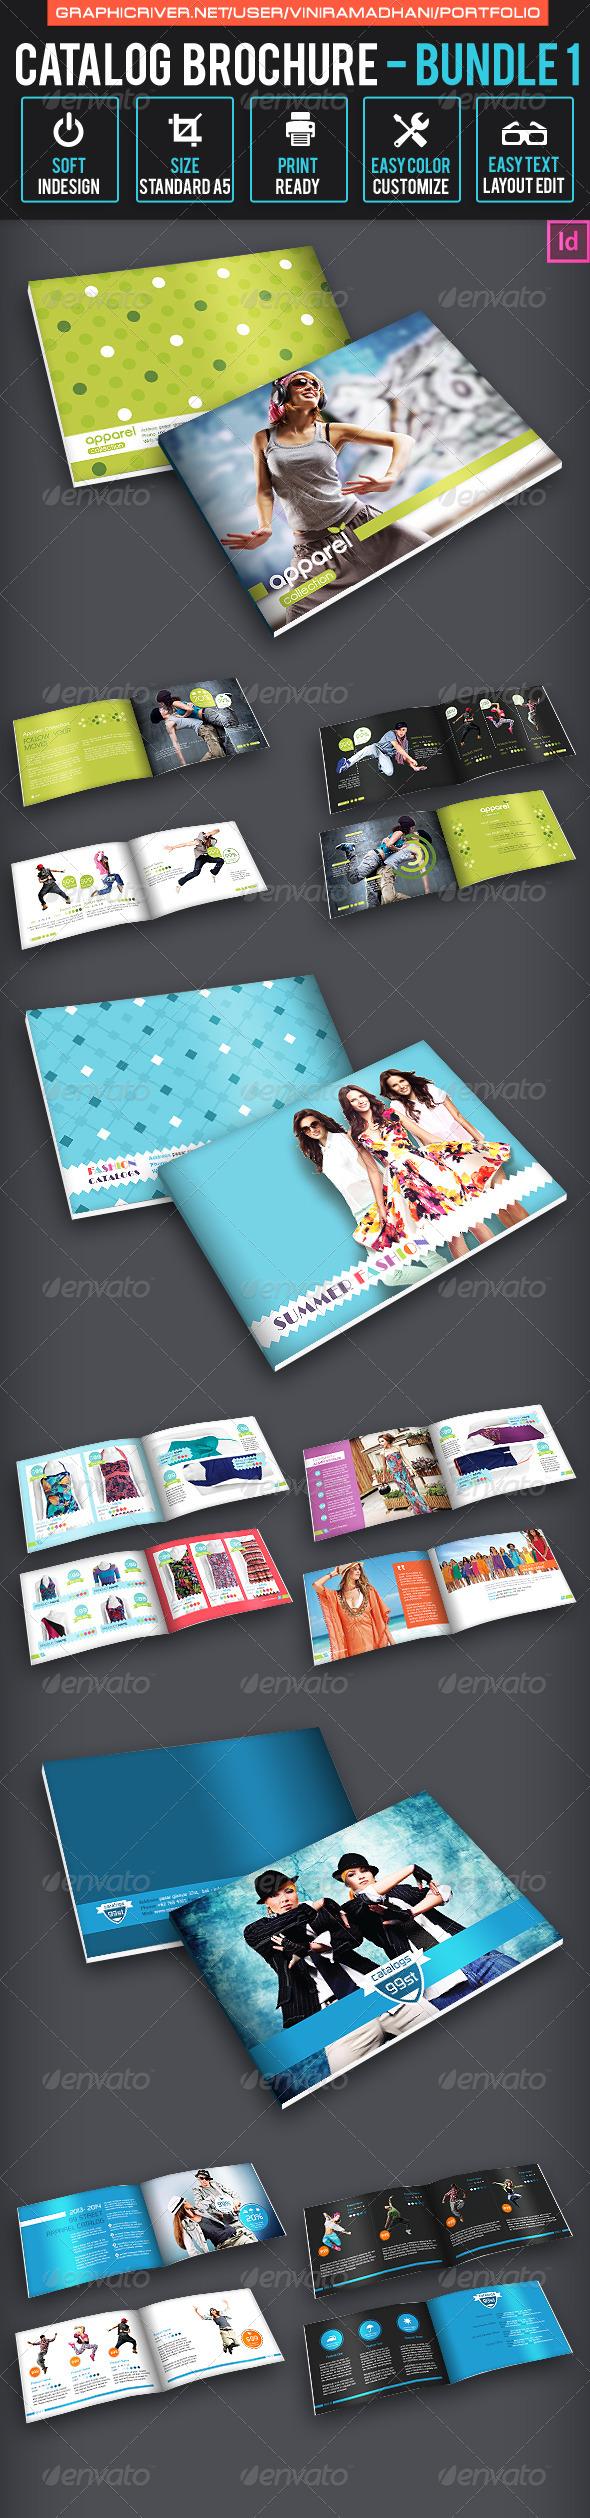 Catalog Brochure Bundle 1 - Catalogs Brochures